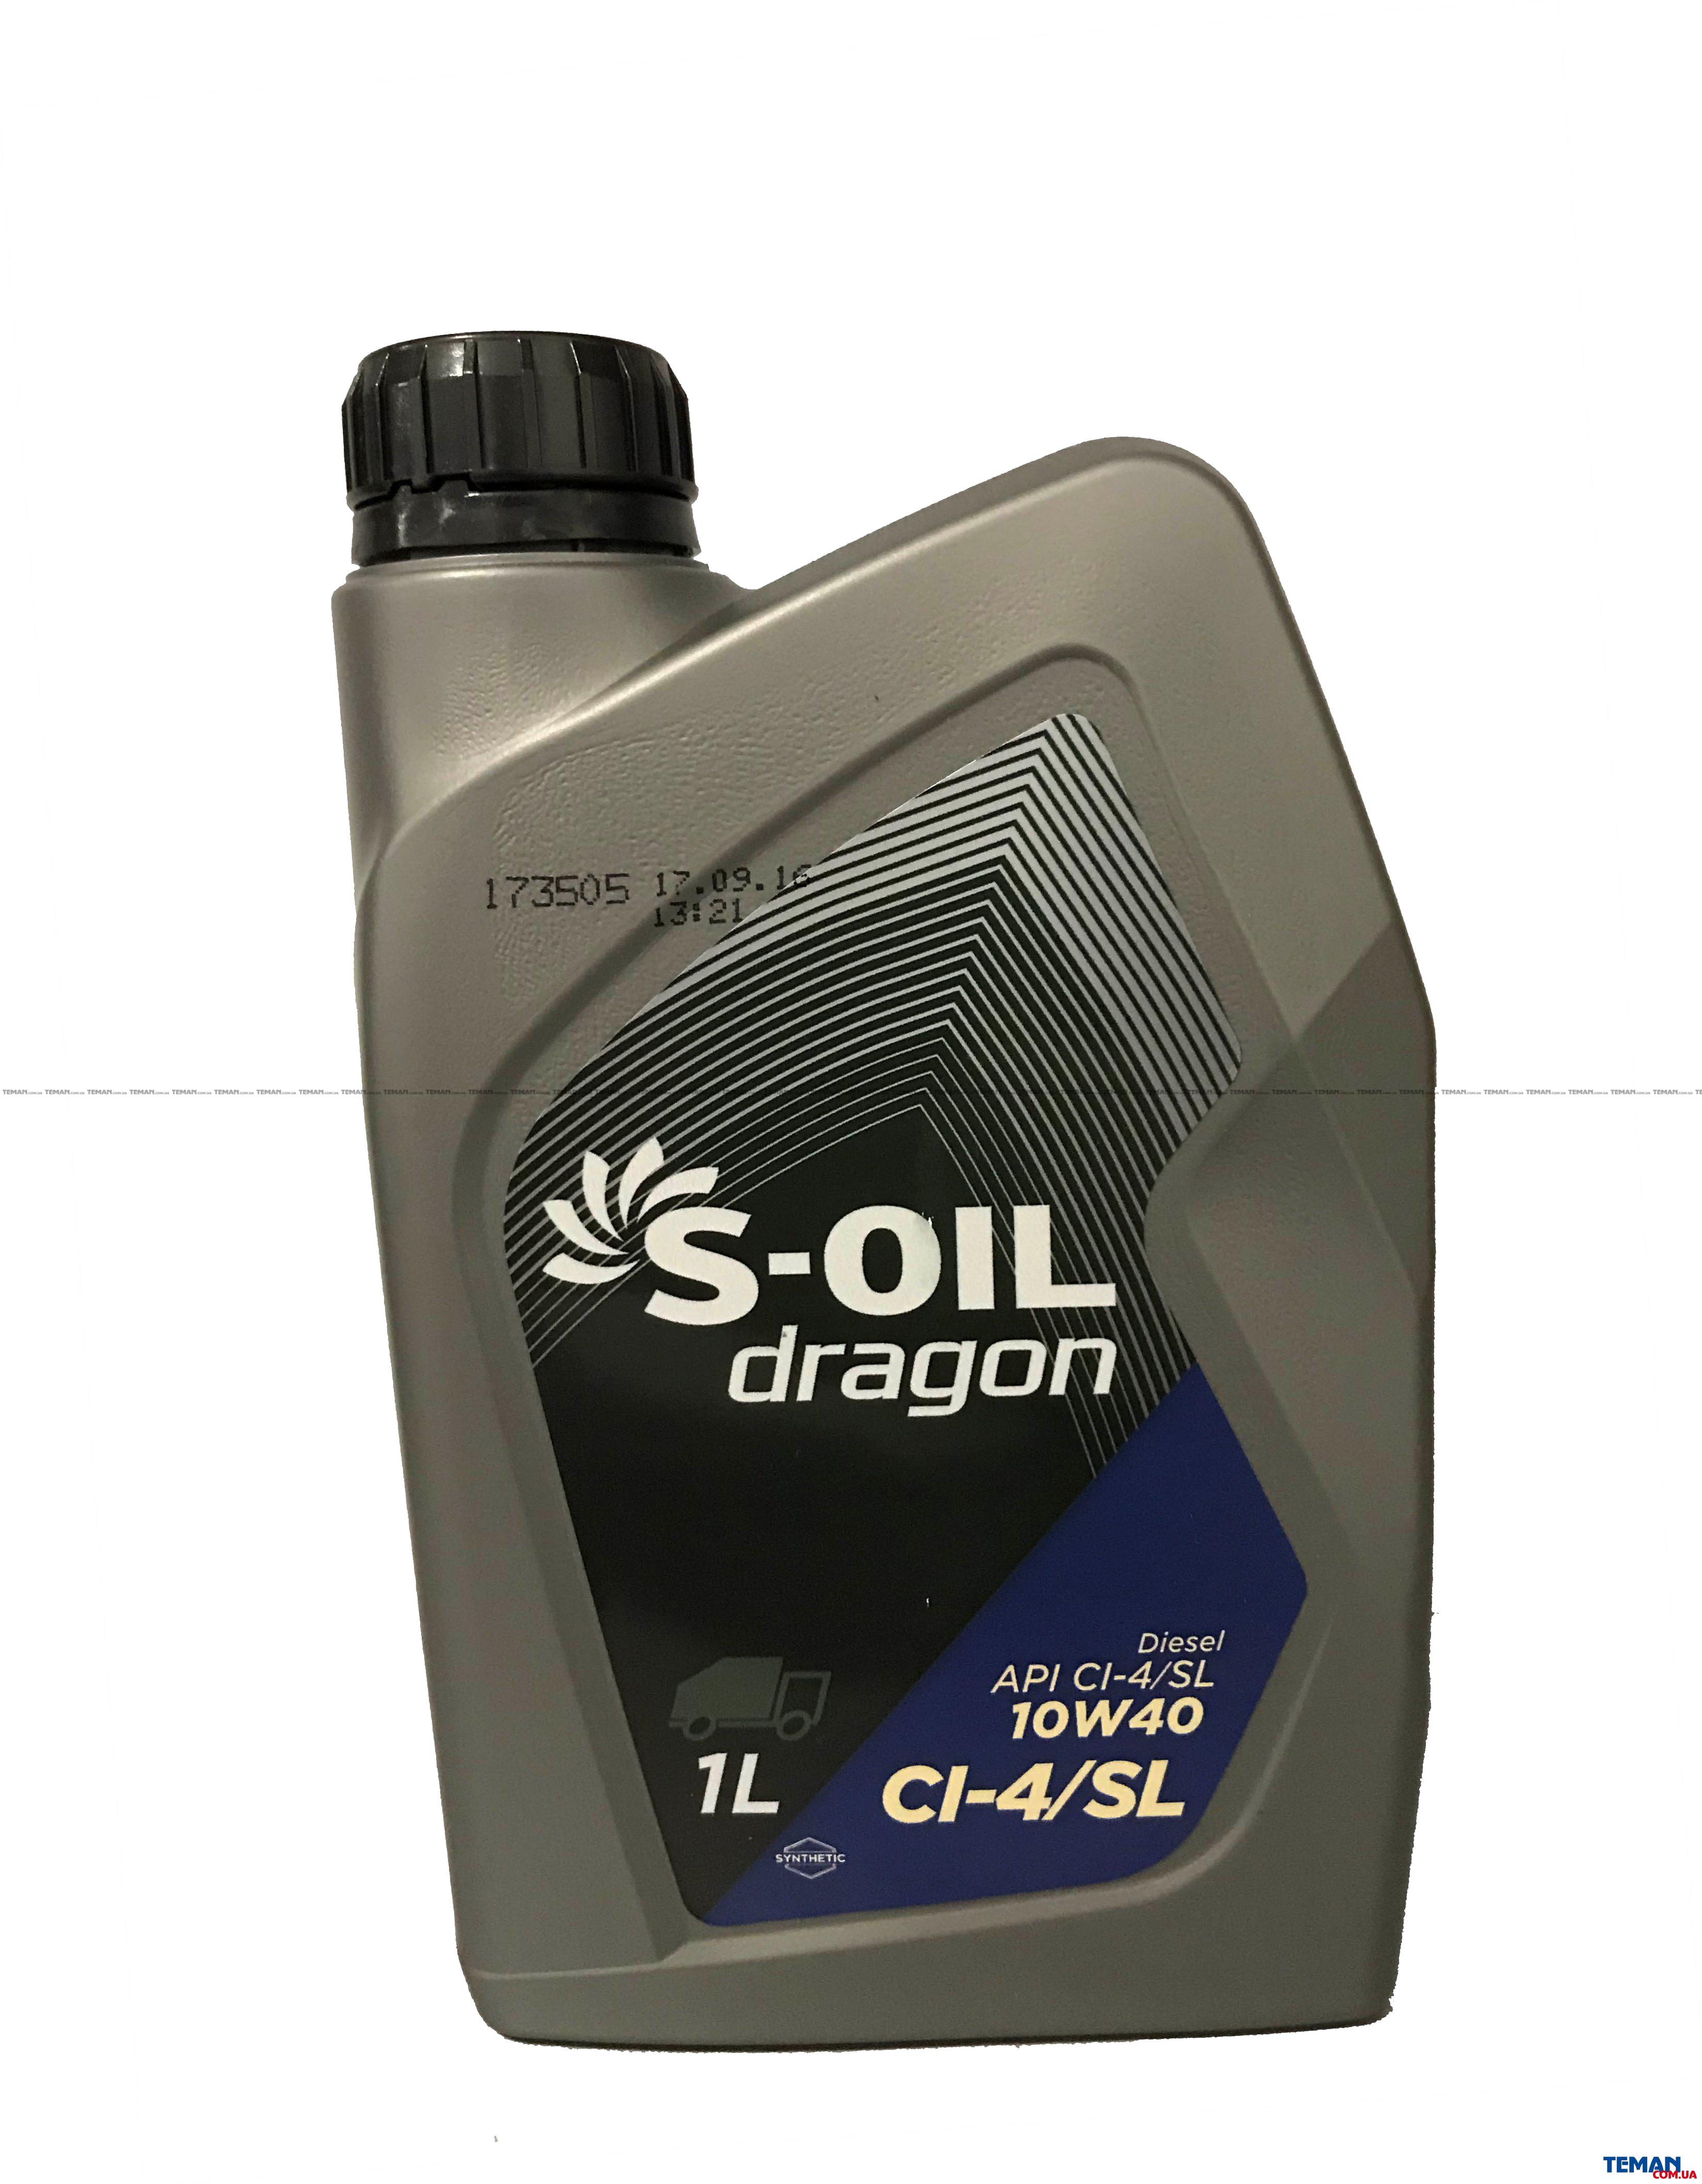 Cинтетическое моторное масло DRAGON CI-4/SL 10W40 1л